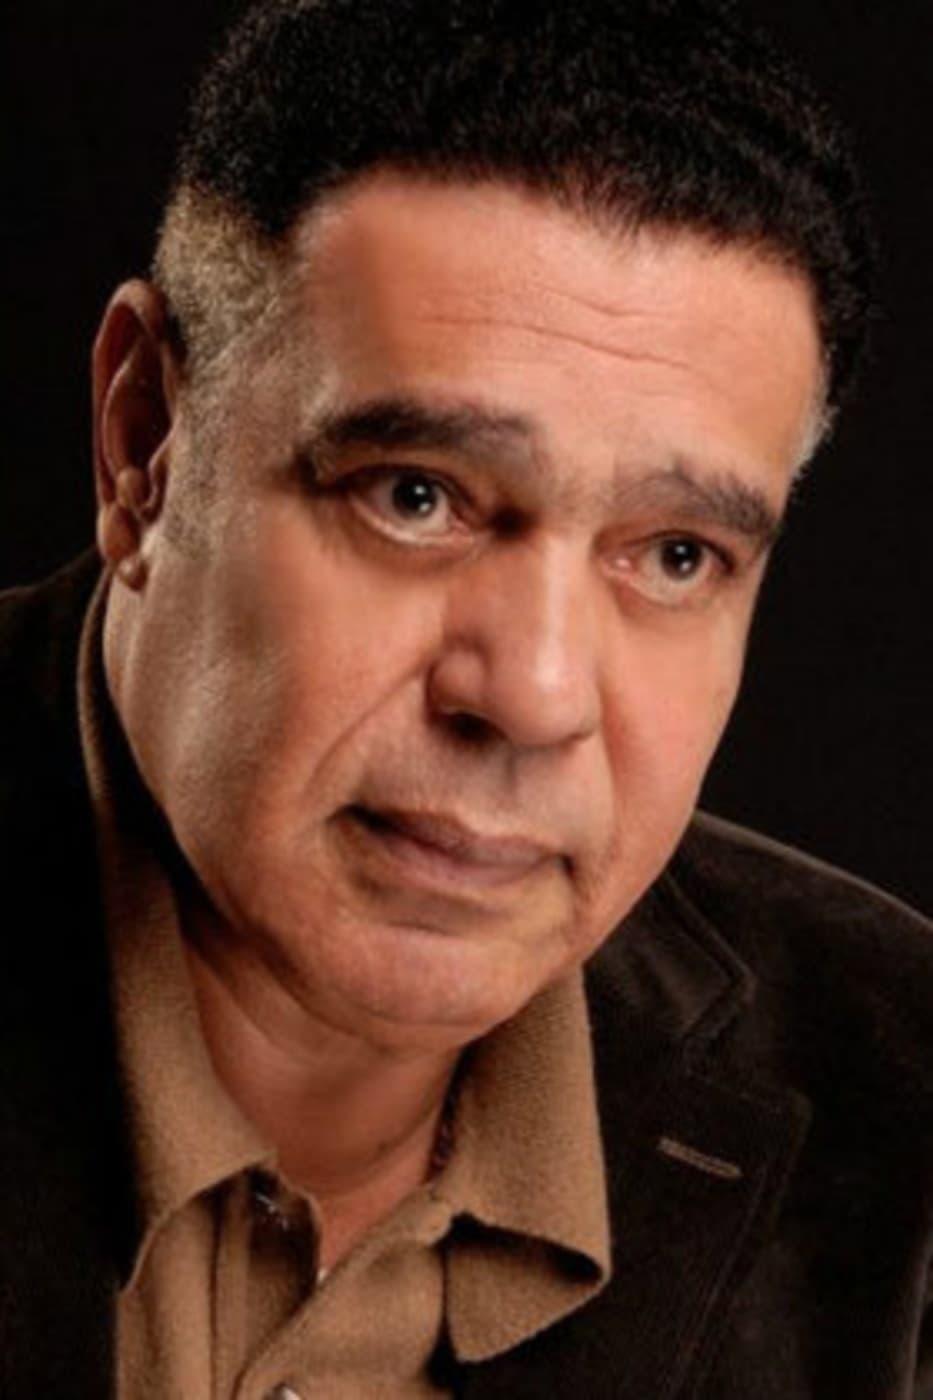 Samy El Adl